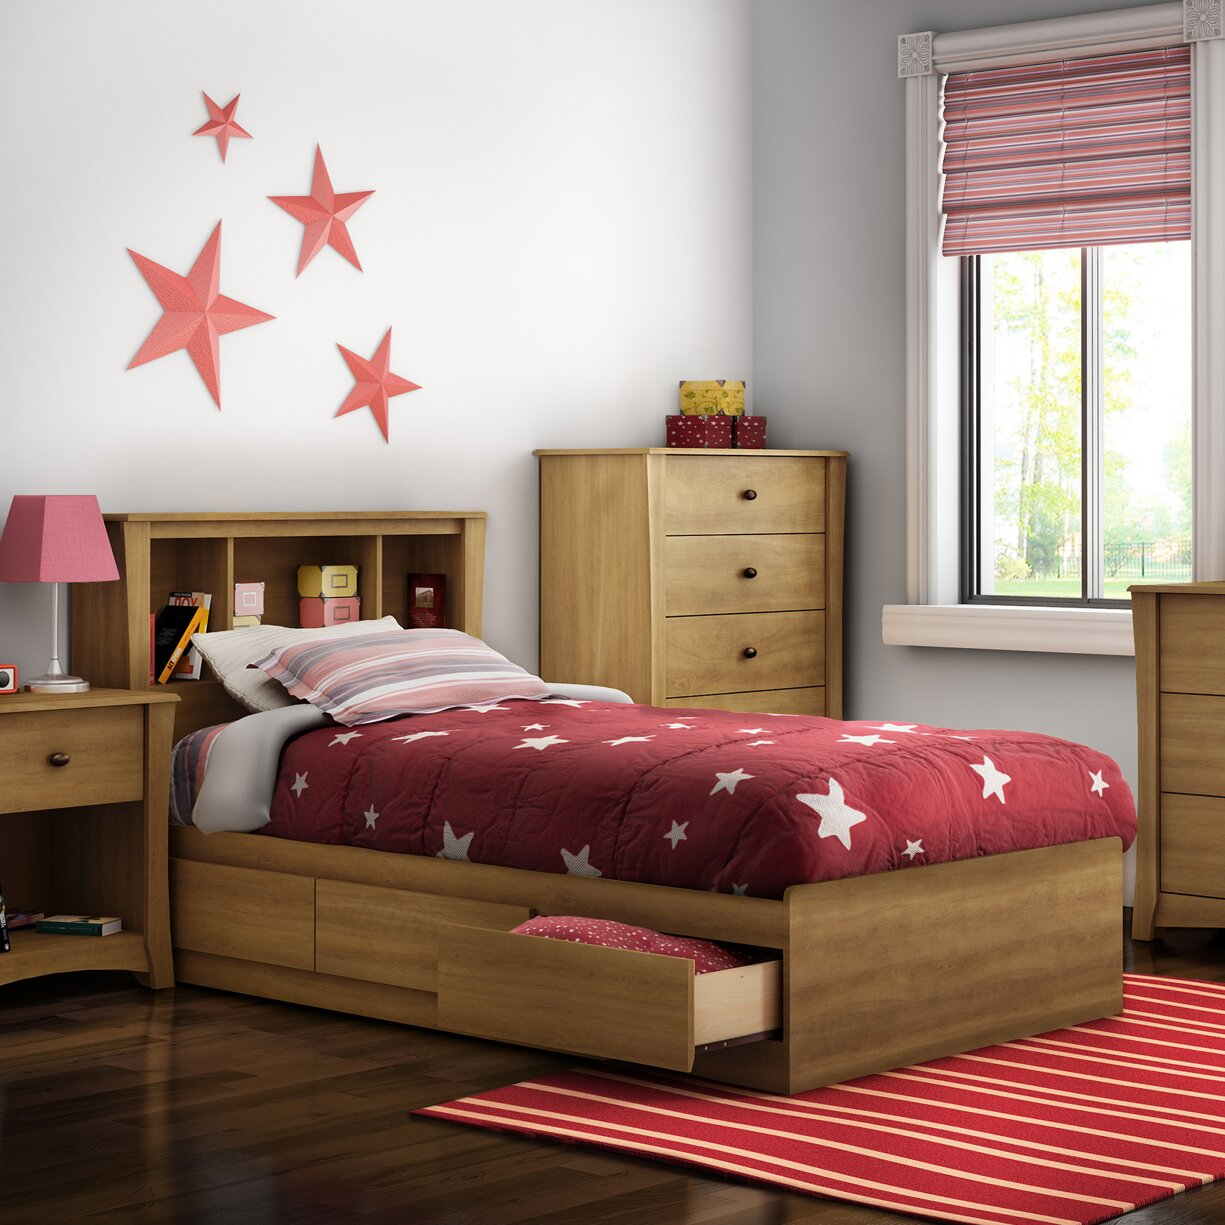 south shore jumper twin platform customizable bedroom set reviews wayfair. Black Bedroom Furniture Sets. Home Design Ideas